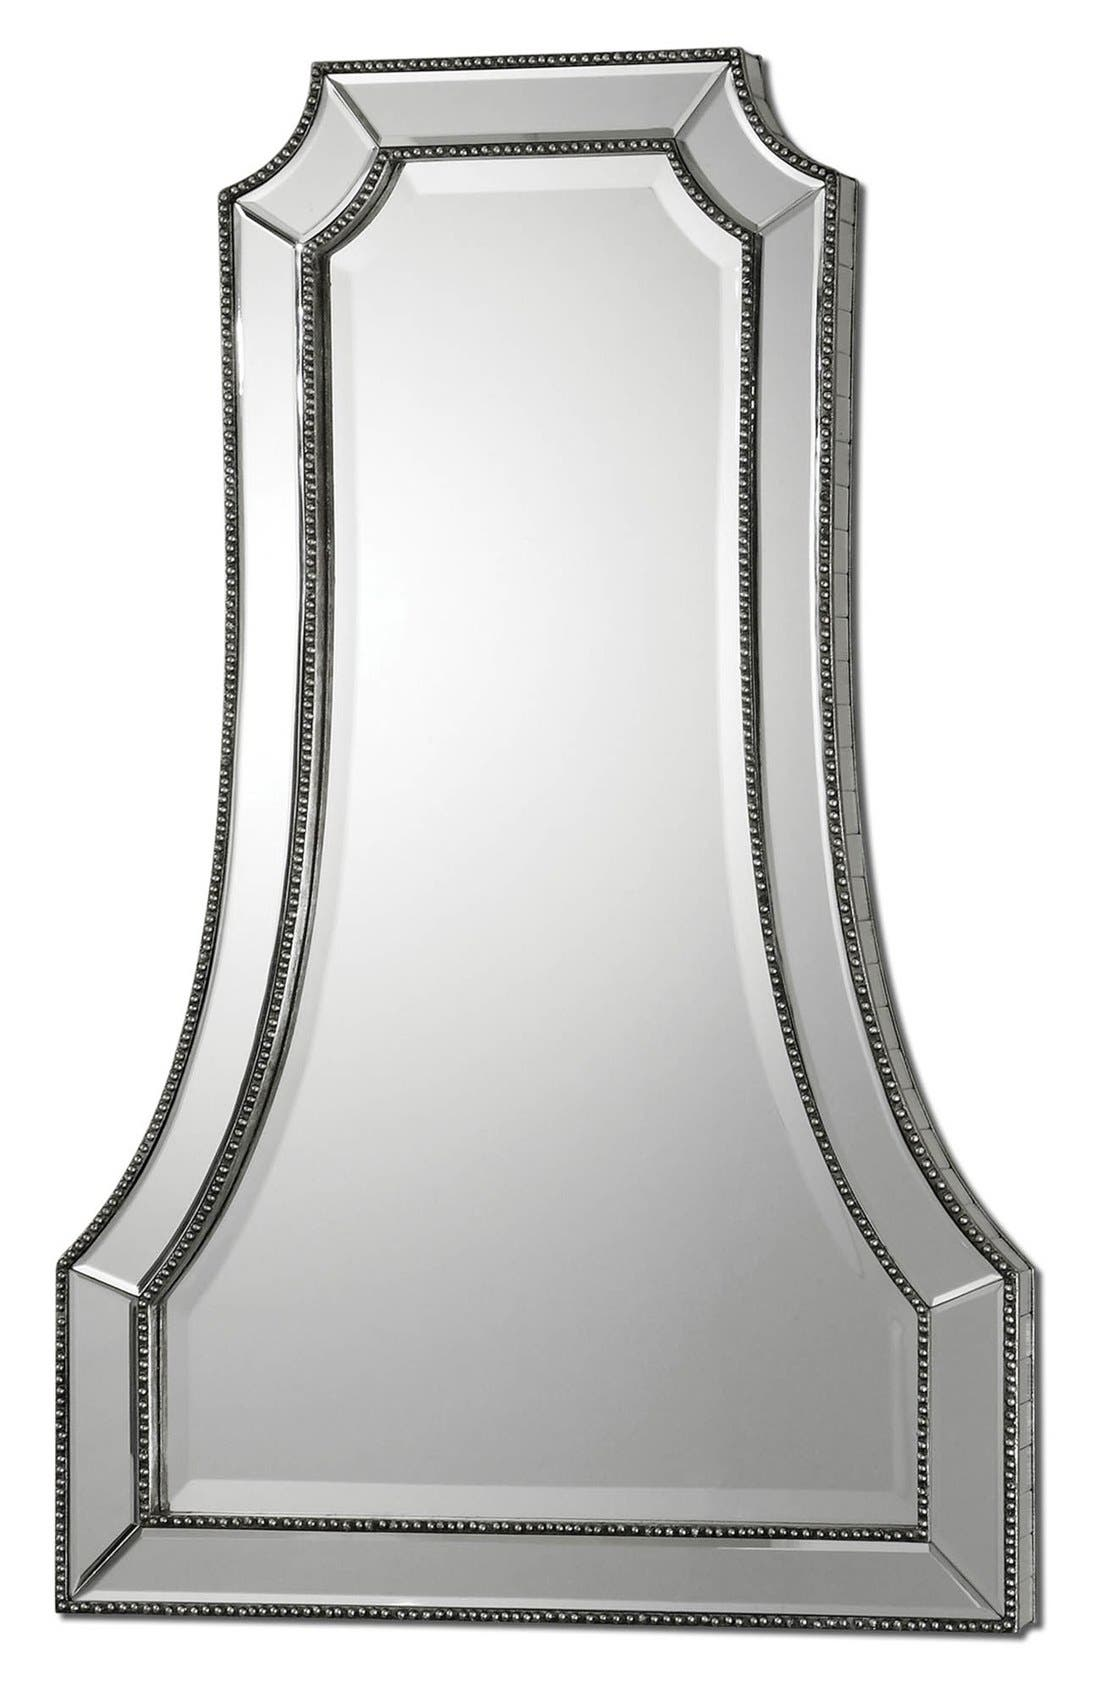 'Cattaneo' Beaded Mirror,                             Main thumbnail 1, color,                             040